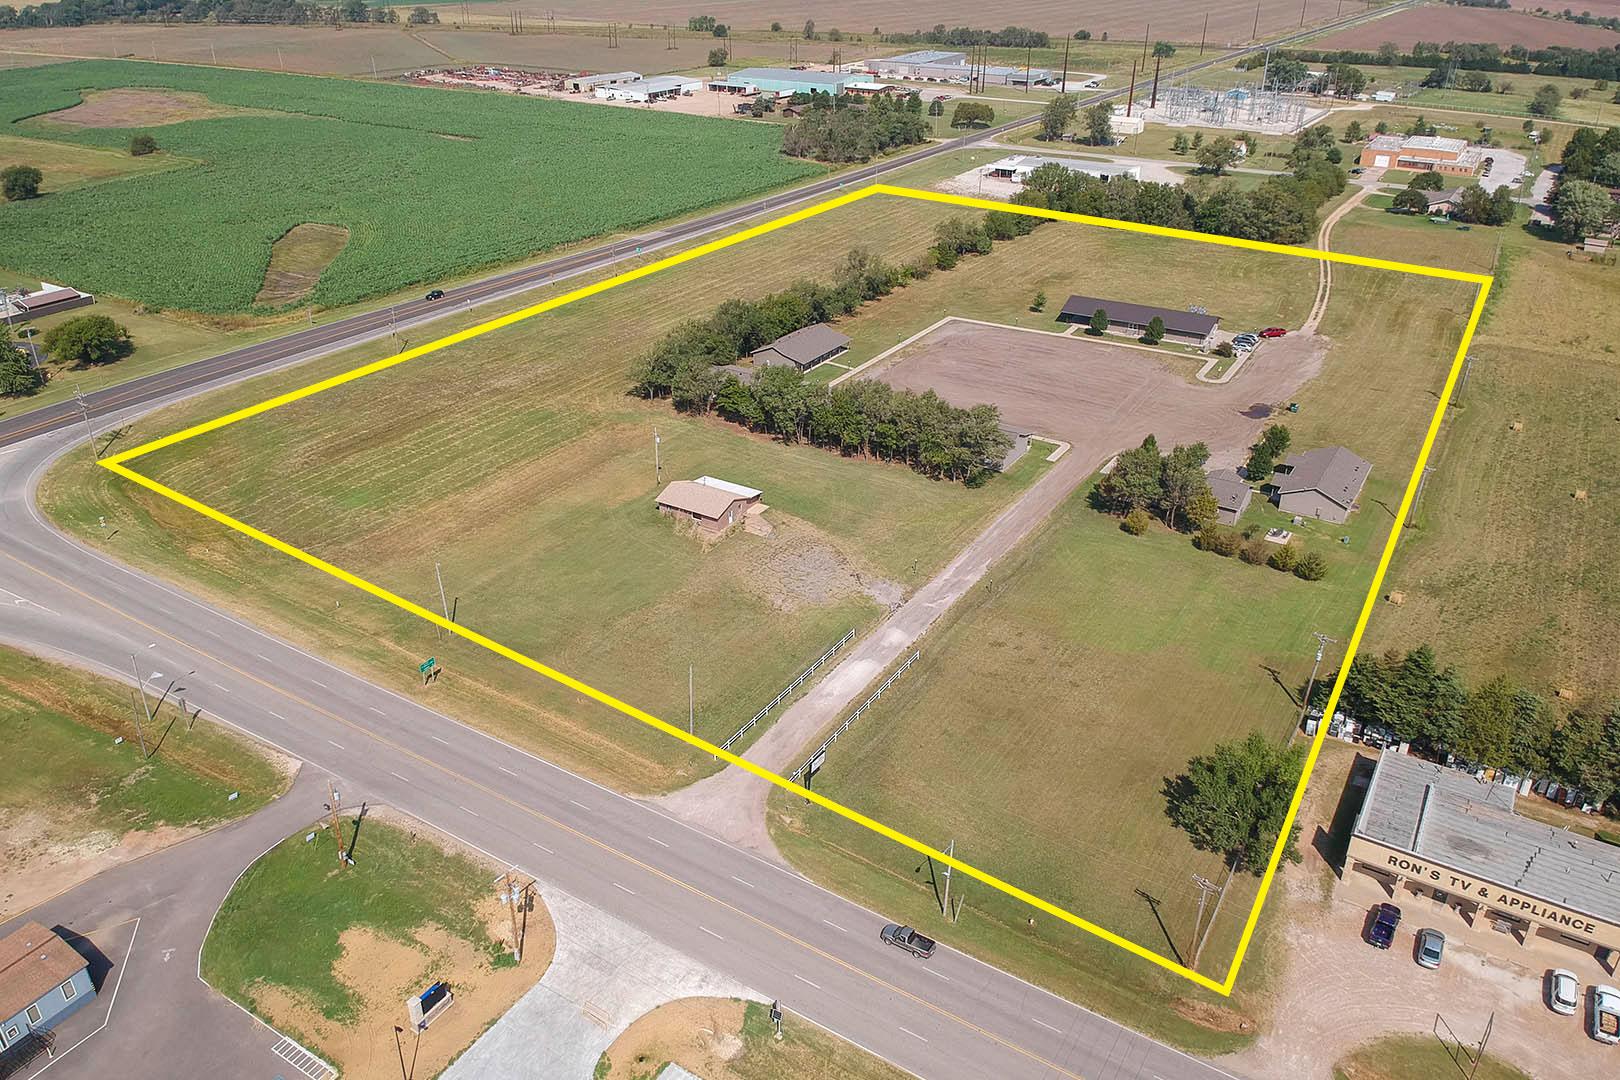 Auction - (Harper) Absolute | 28 Unit Westview Lodge Hotel & Apartments Built In 2012 - HARPER, KS